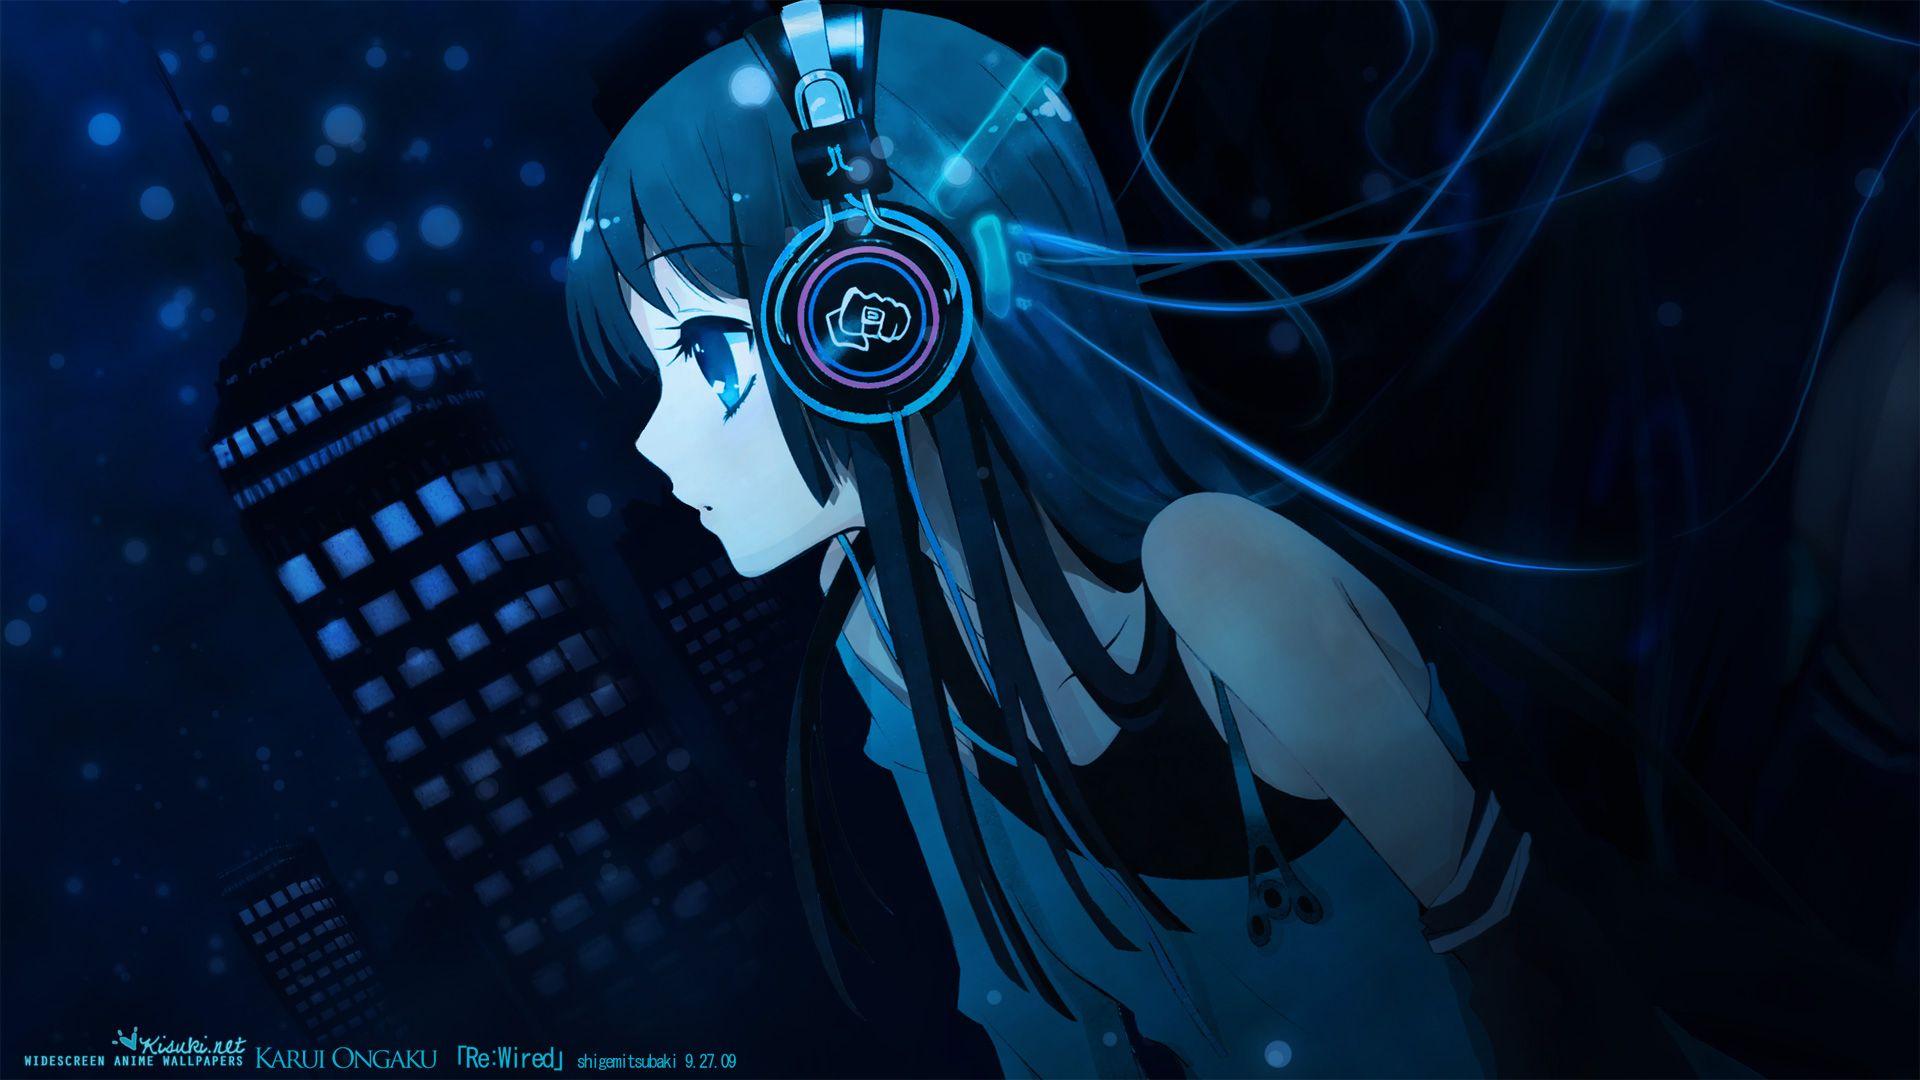 Hd wallpaper anime - Blue Anime Girl Music Hd Desktop Wallpaper Free 89282 Wallpaper